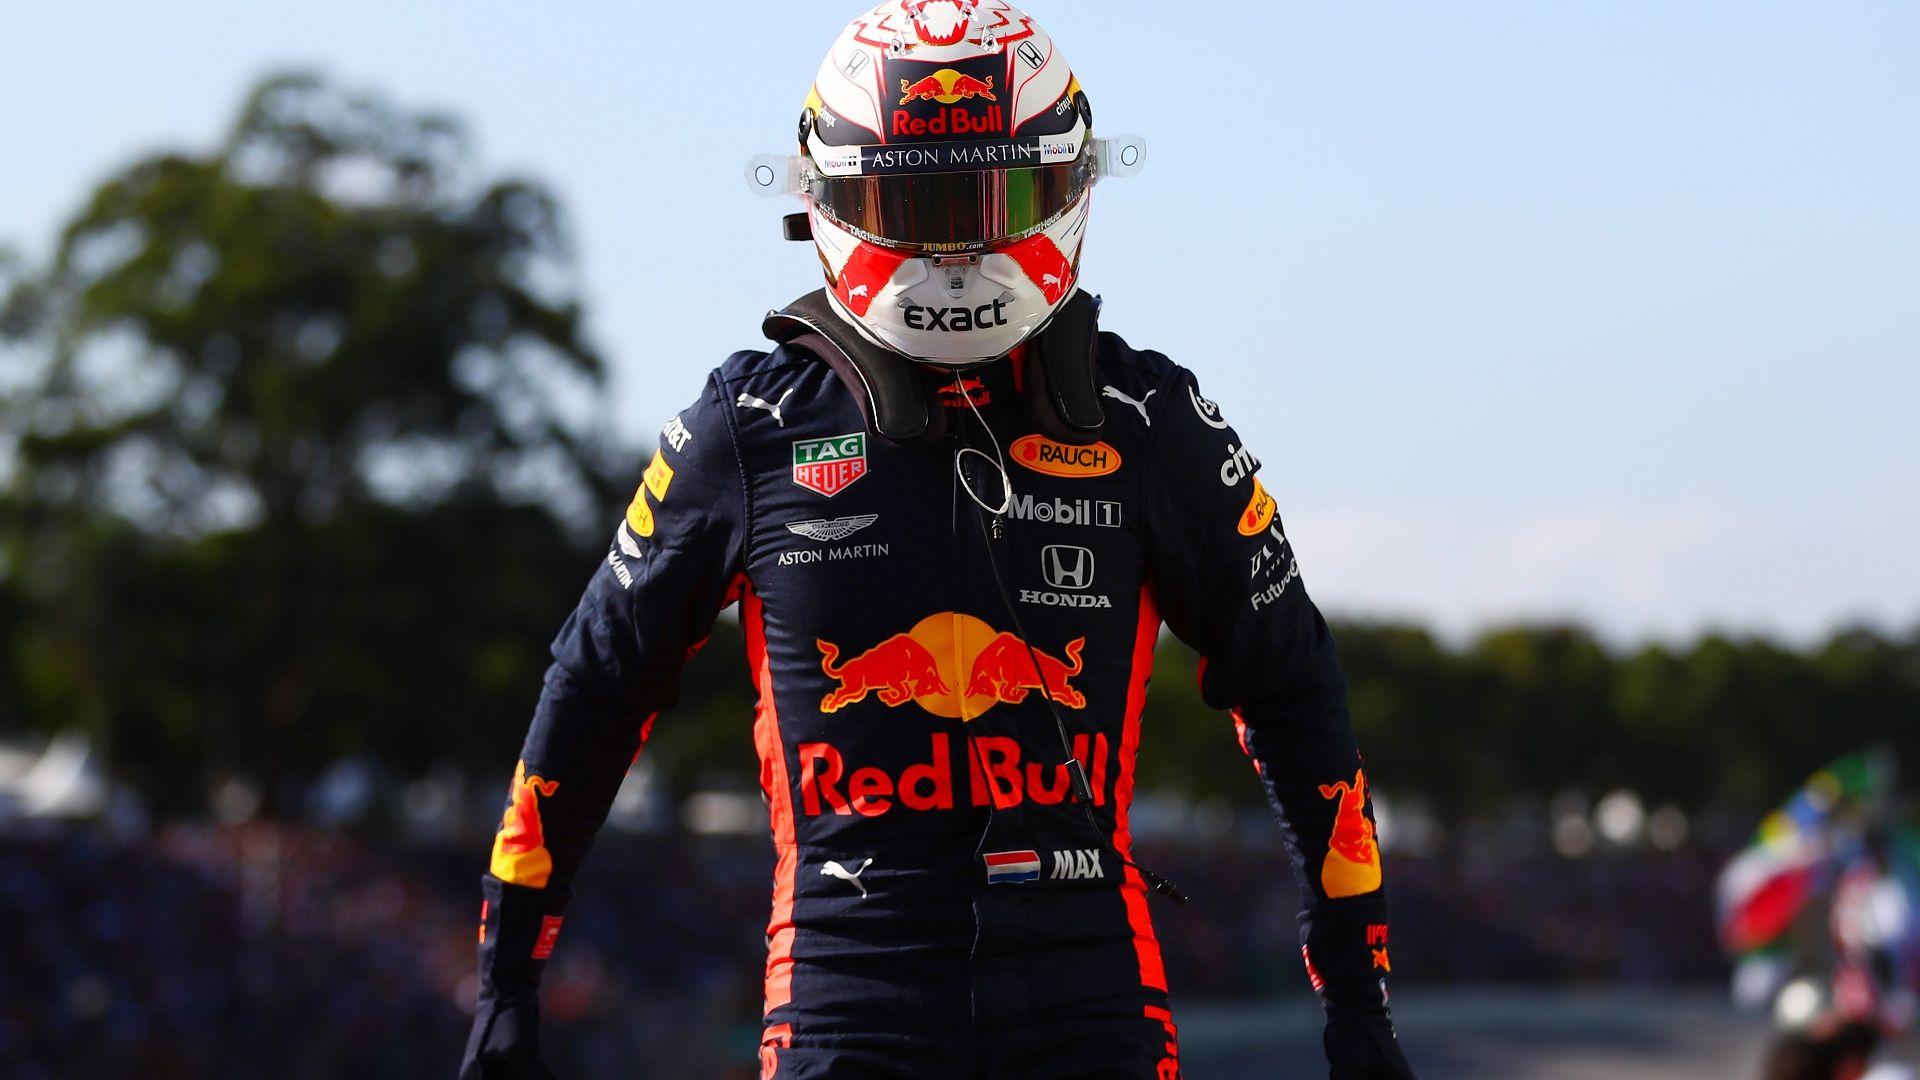 Шампион на Формула 1: Верстапен ми напомня на младия Шумахер